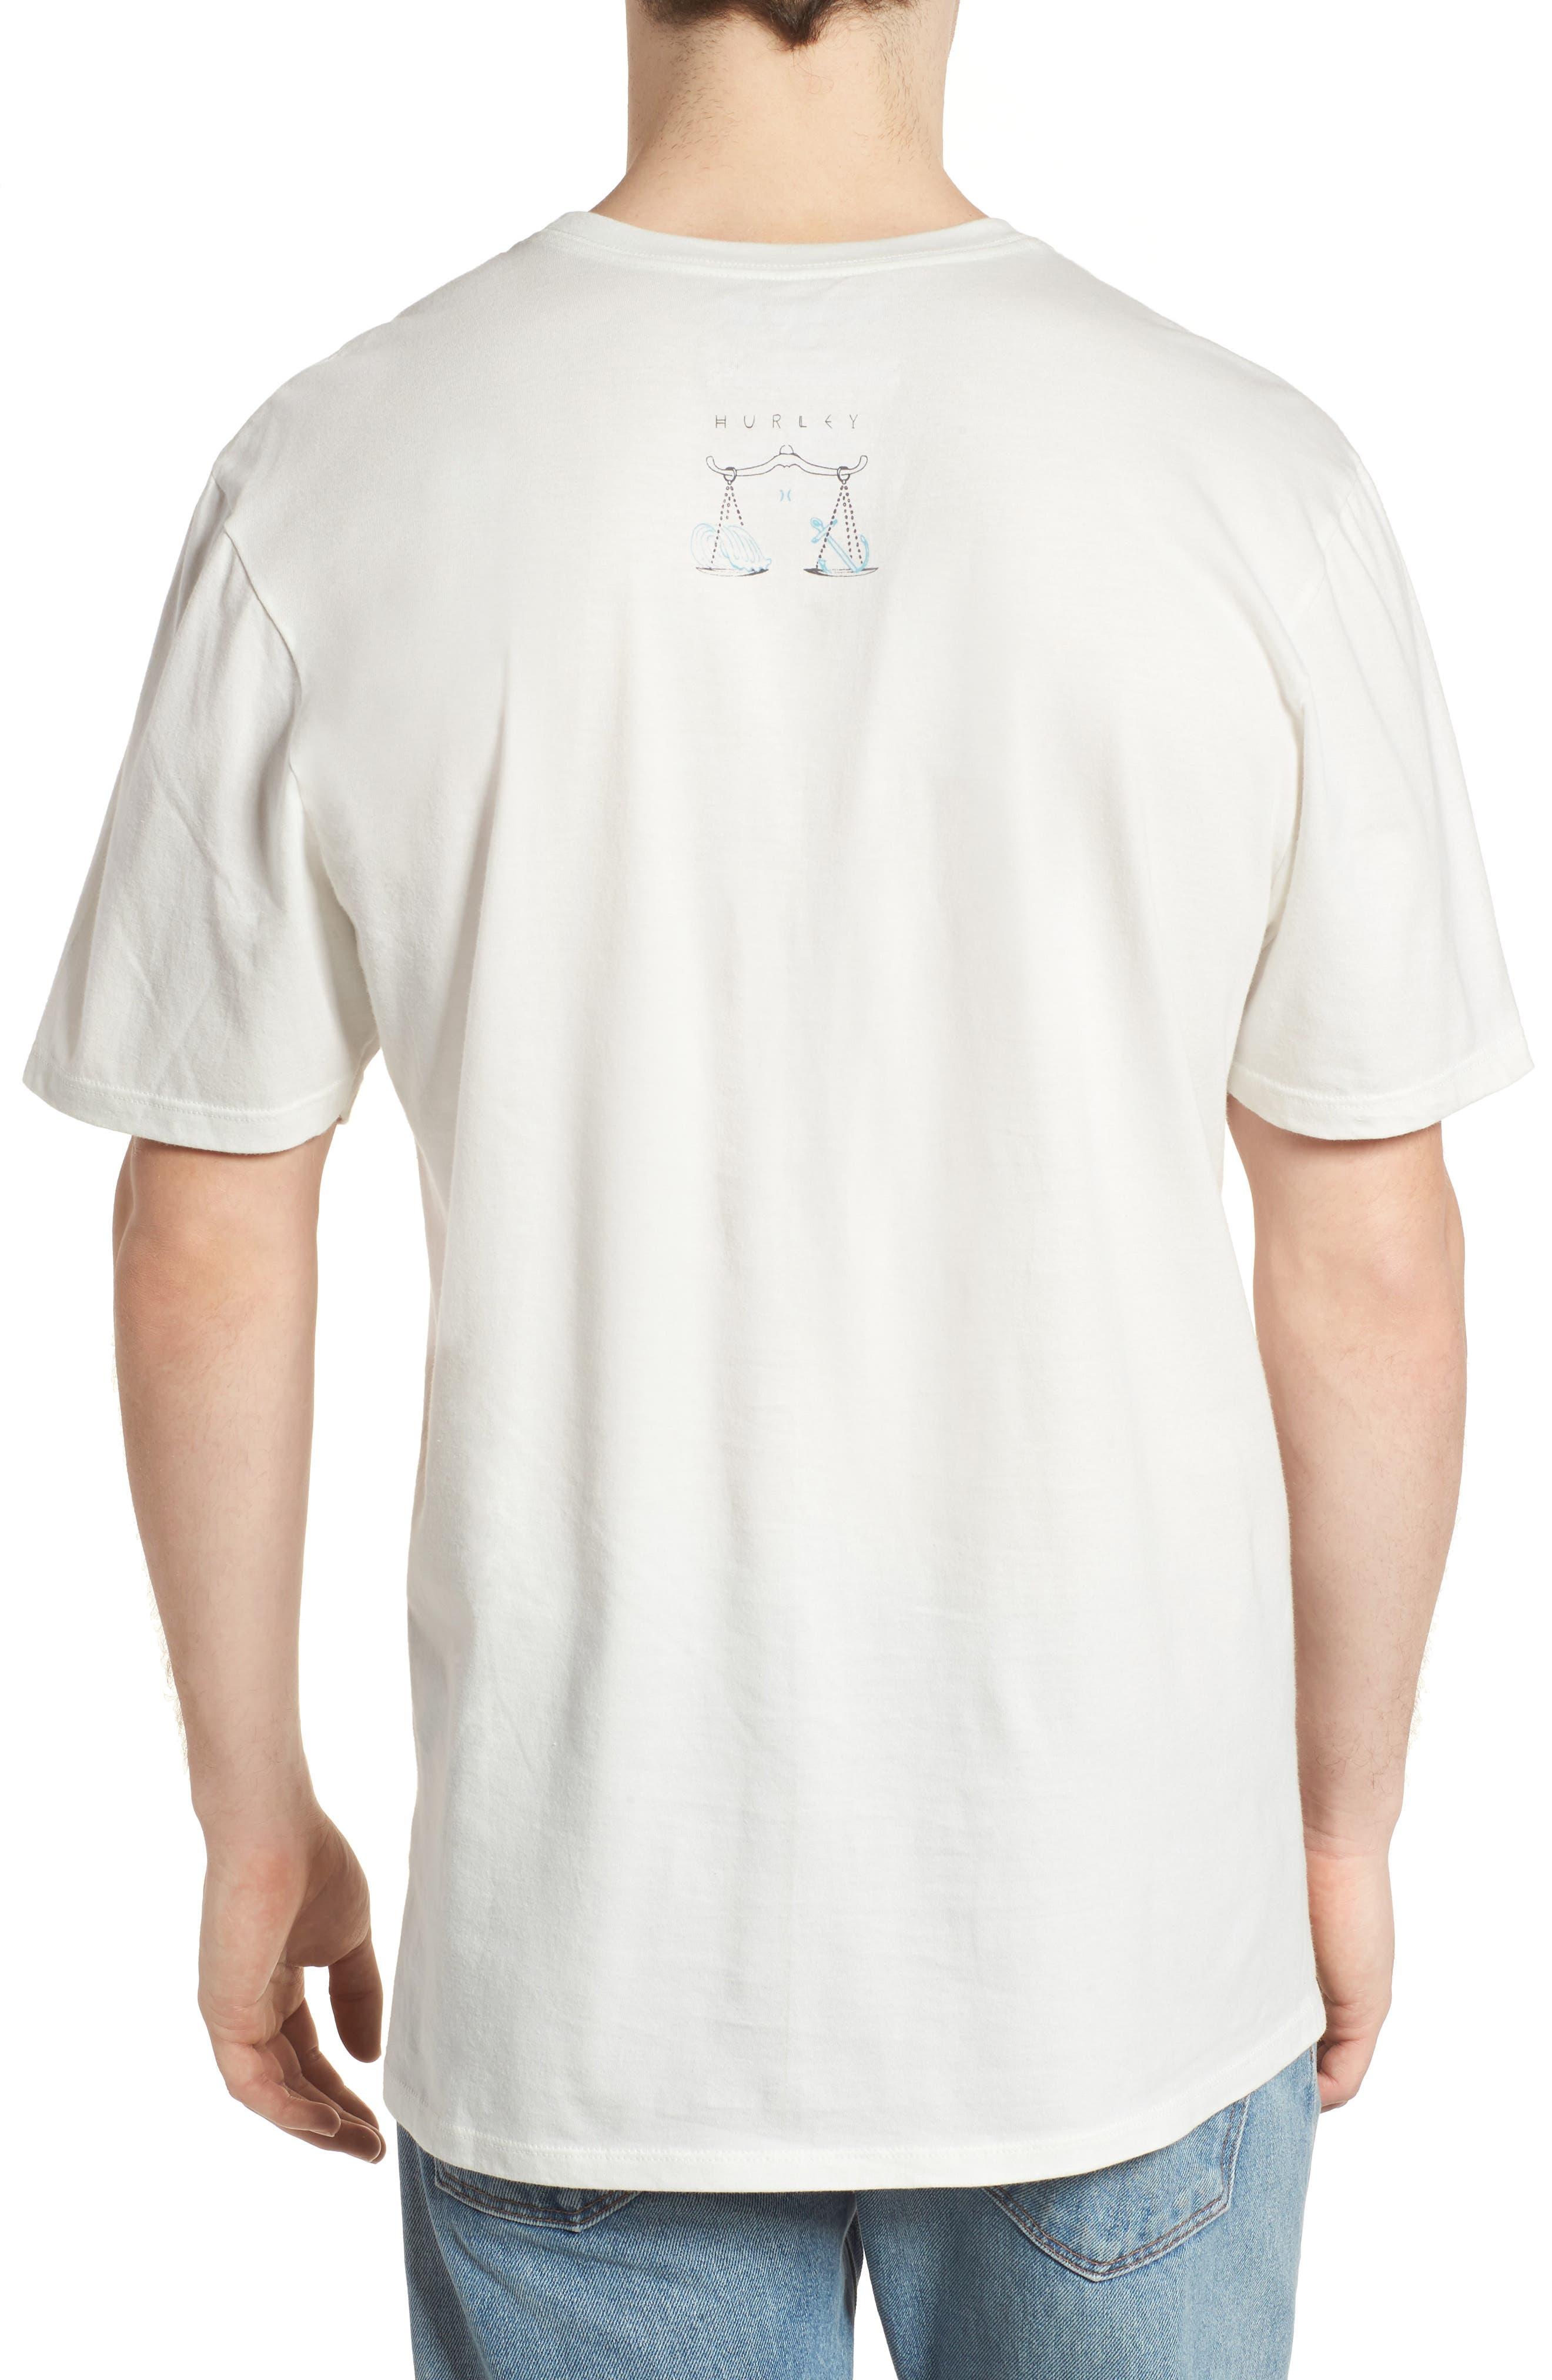 Siren T-Shirt,                             Alternate thumbnail 2, color,                             Sail